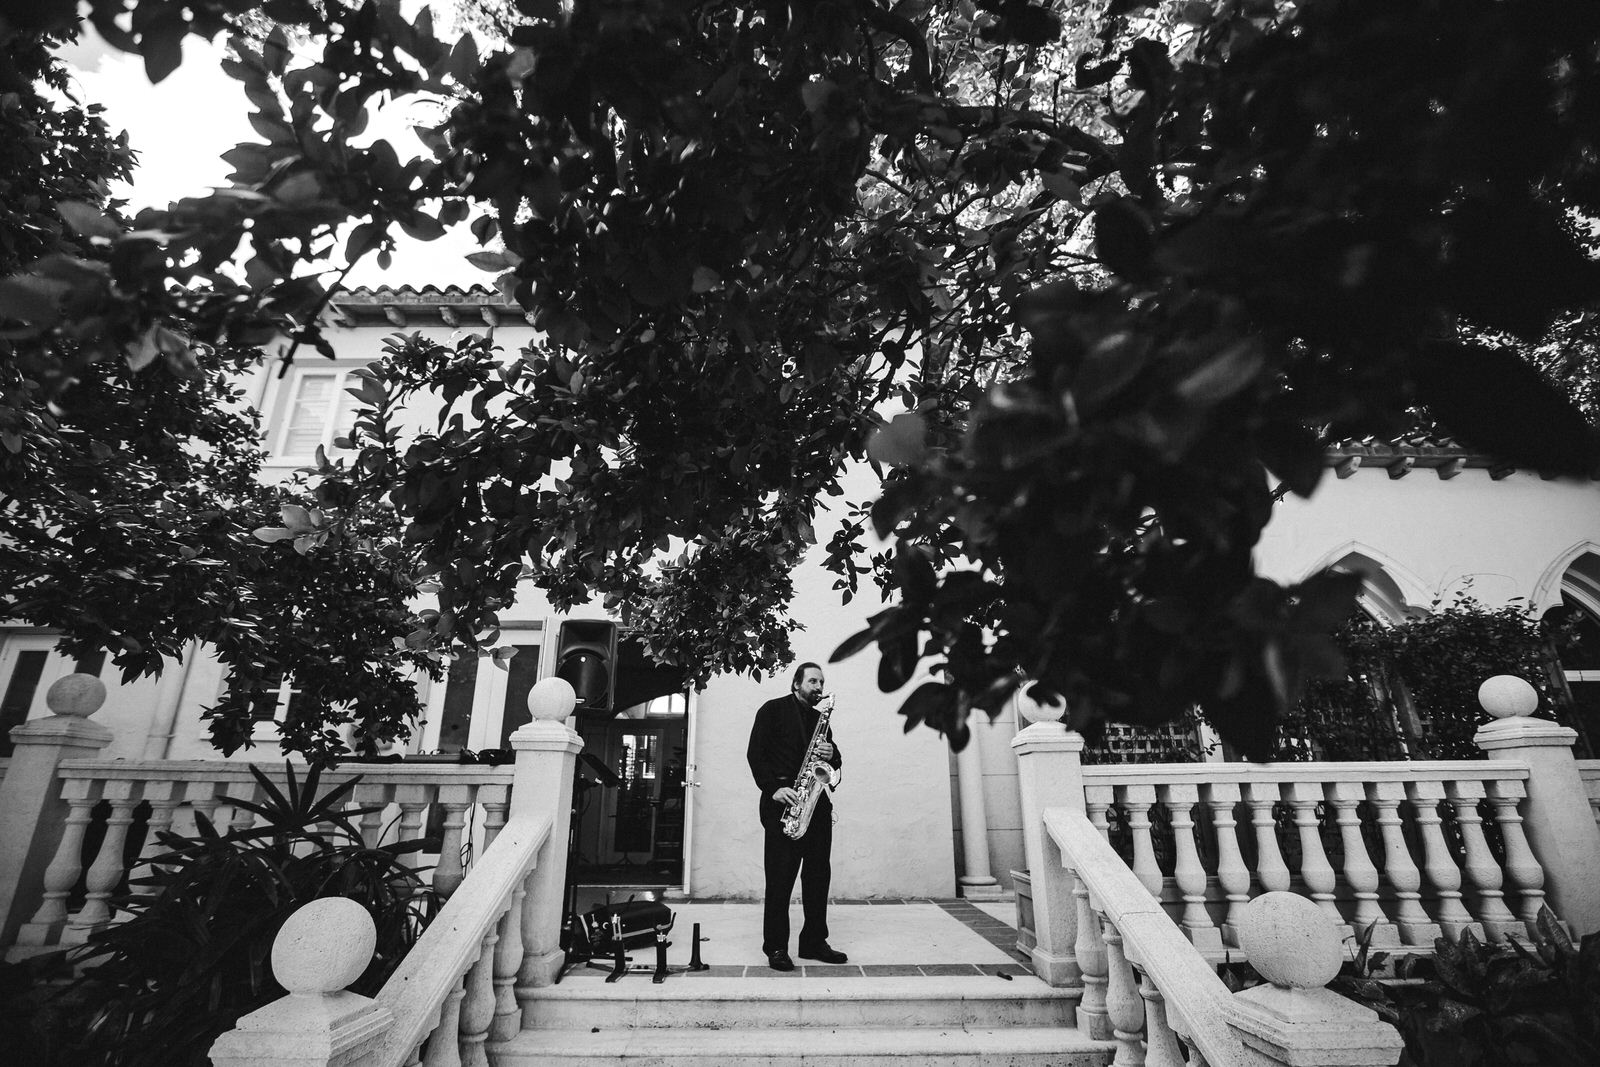 tiny_house_photo_wedding_details_sax_player_the_addison.jpg